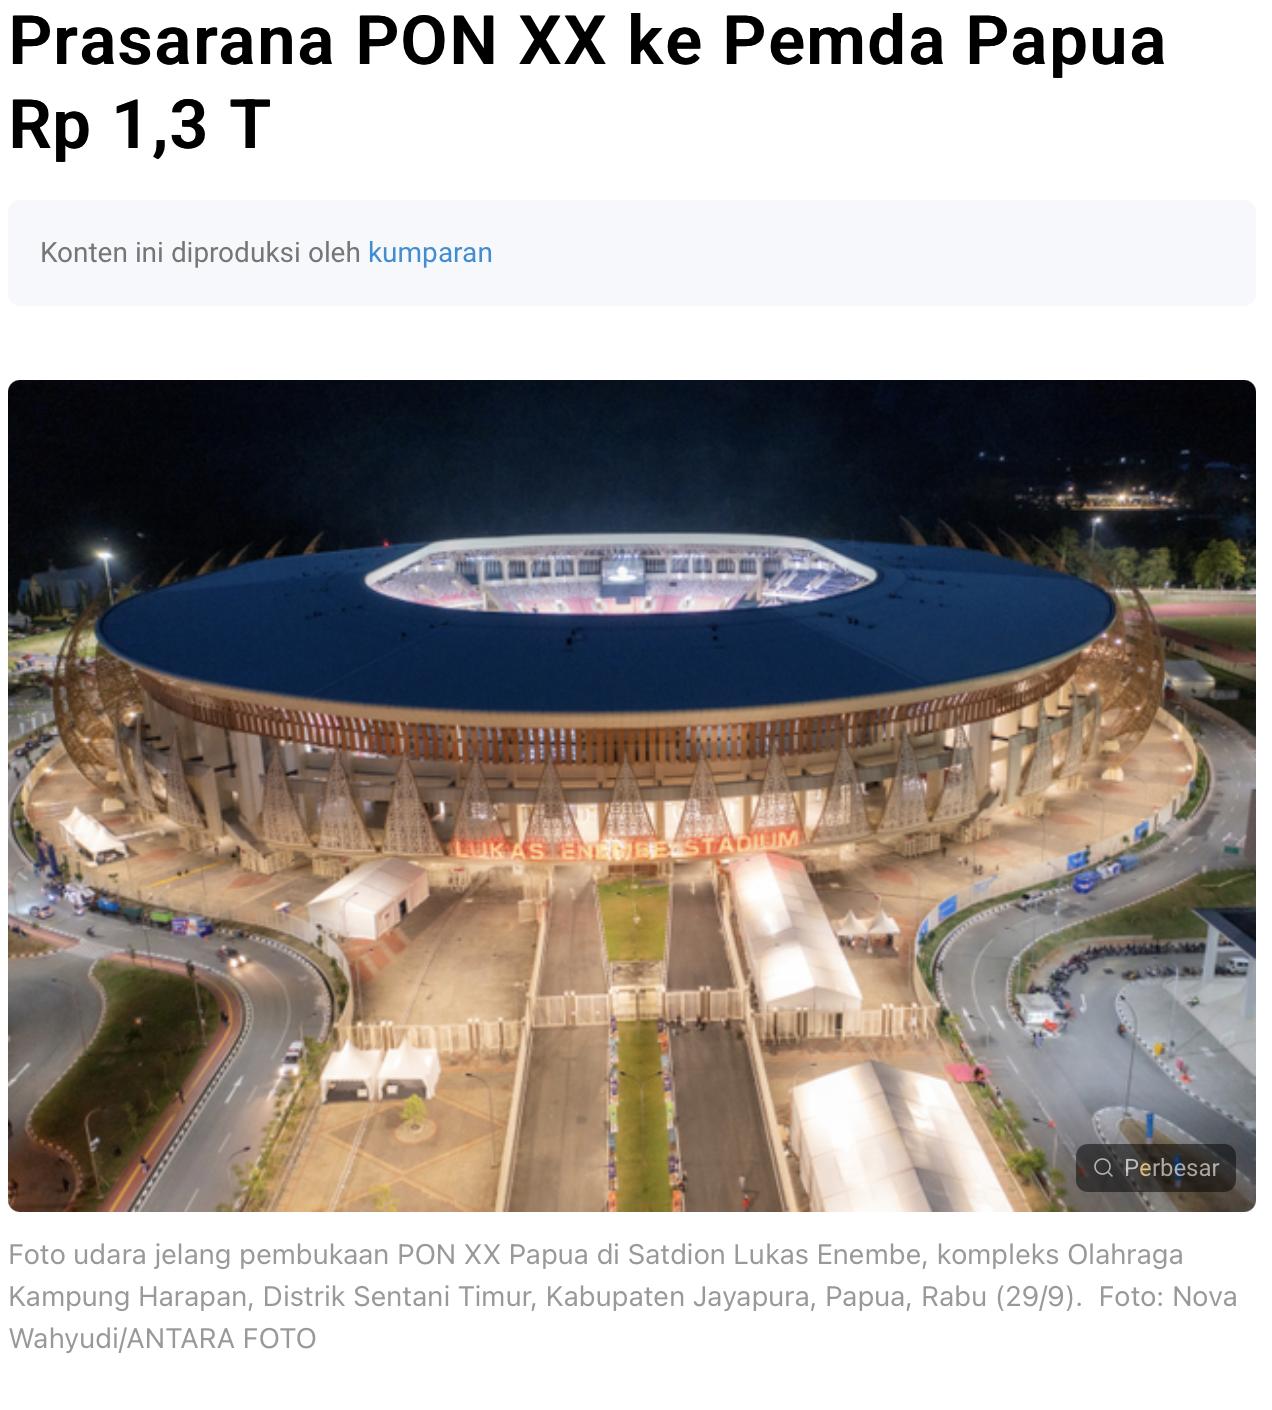 Pemerintah Hibahkan Sarana Prasarana PON XX ke Pemda Papua Rp 1,3 T